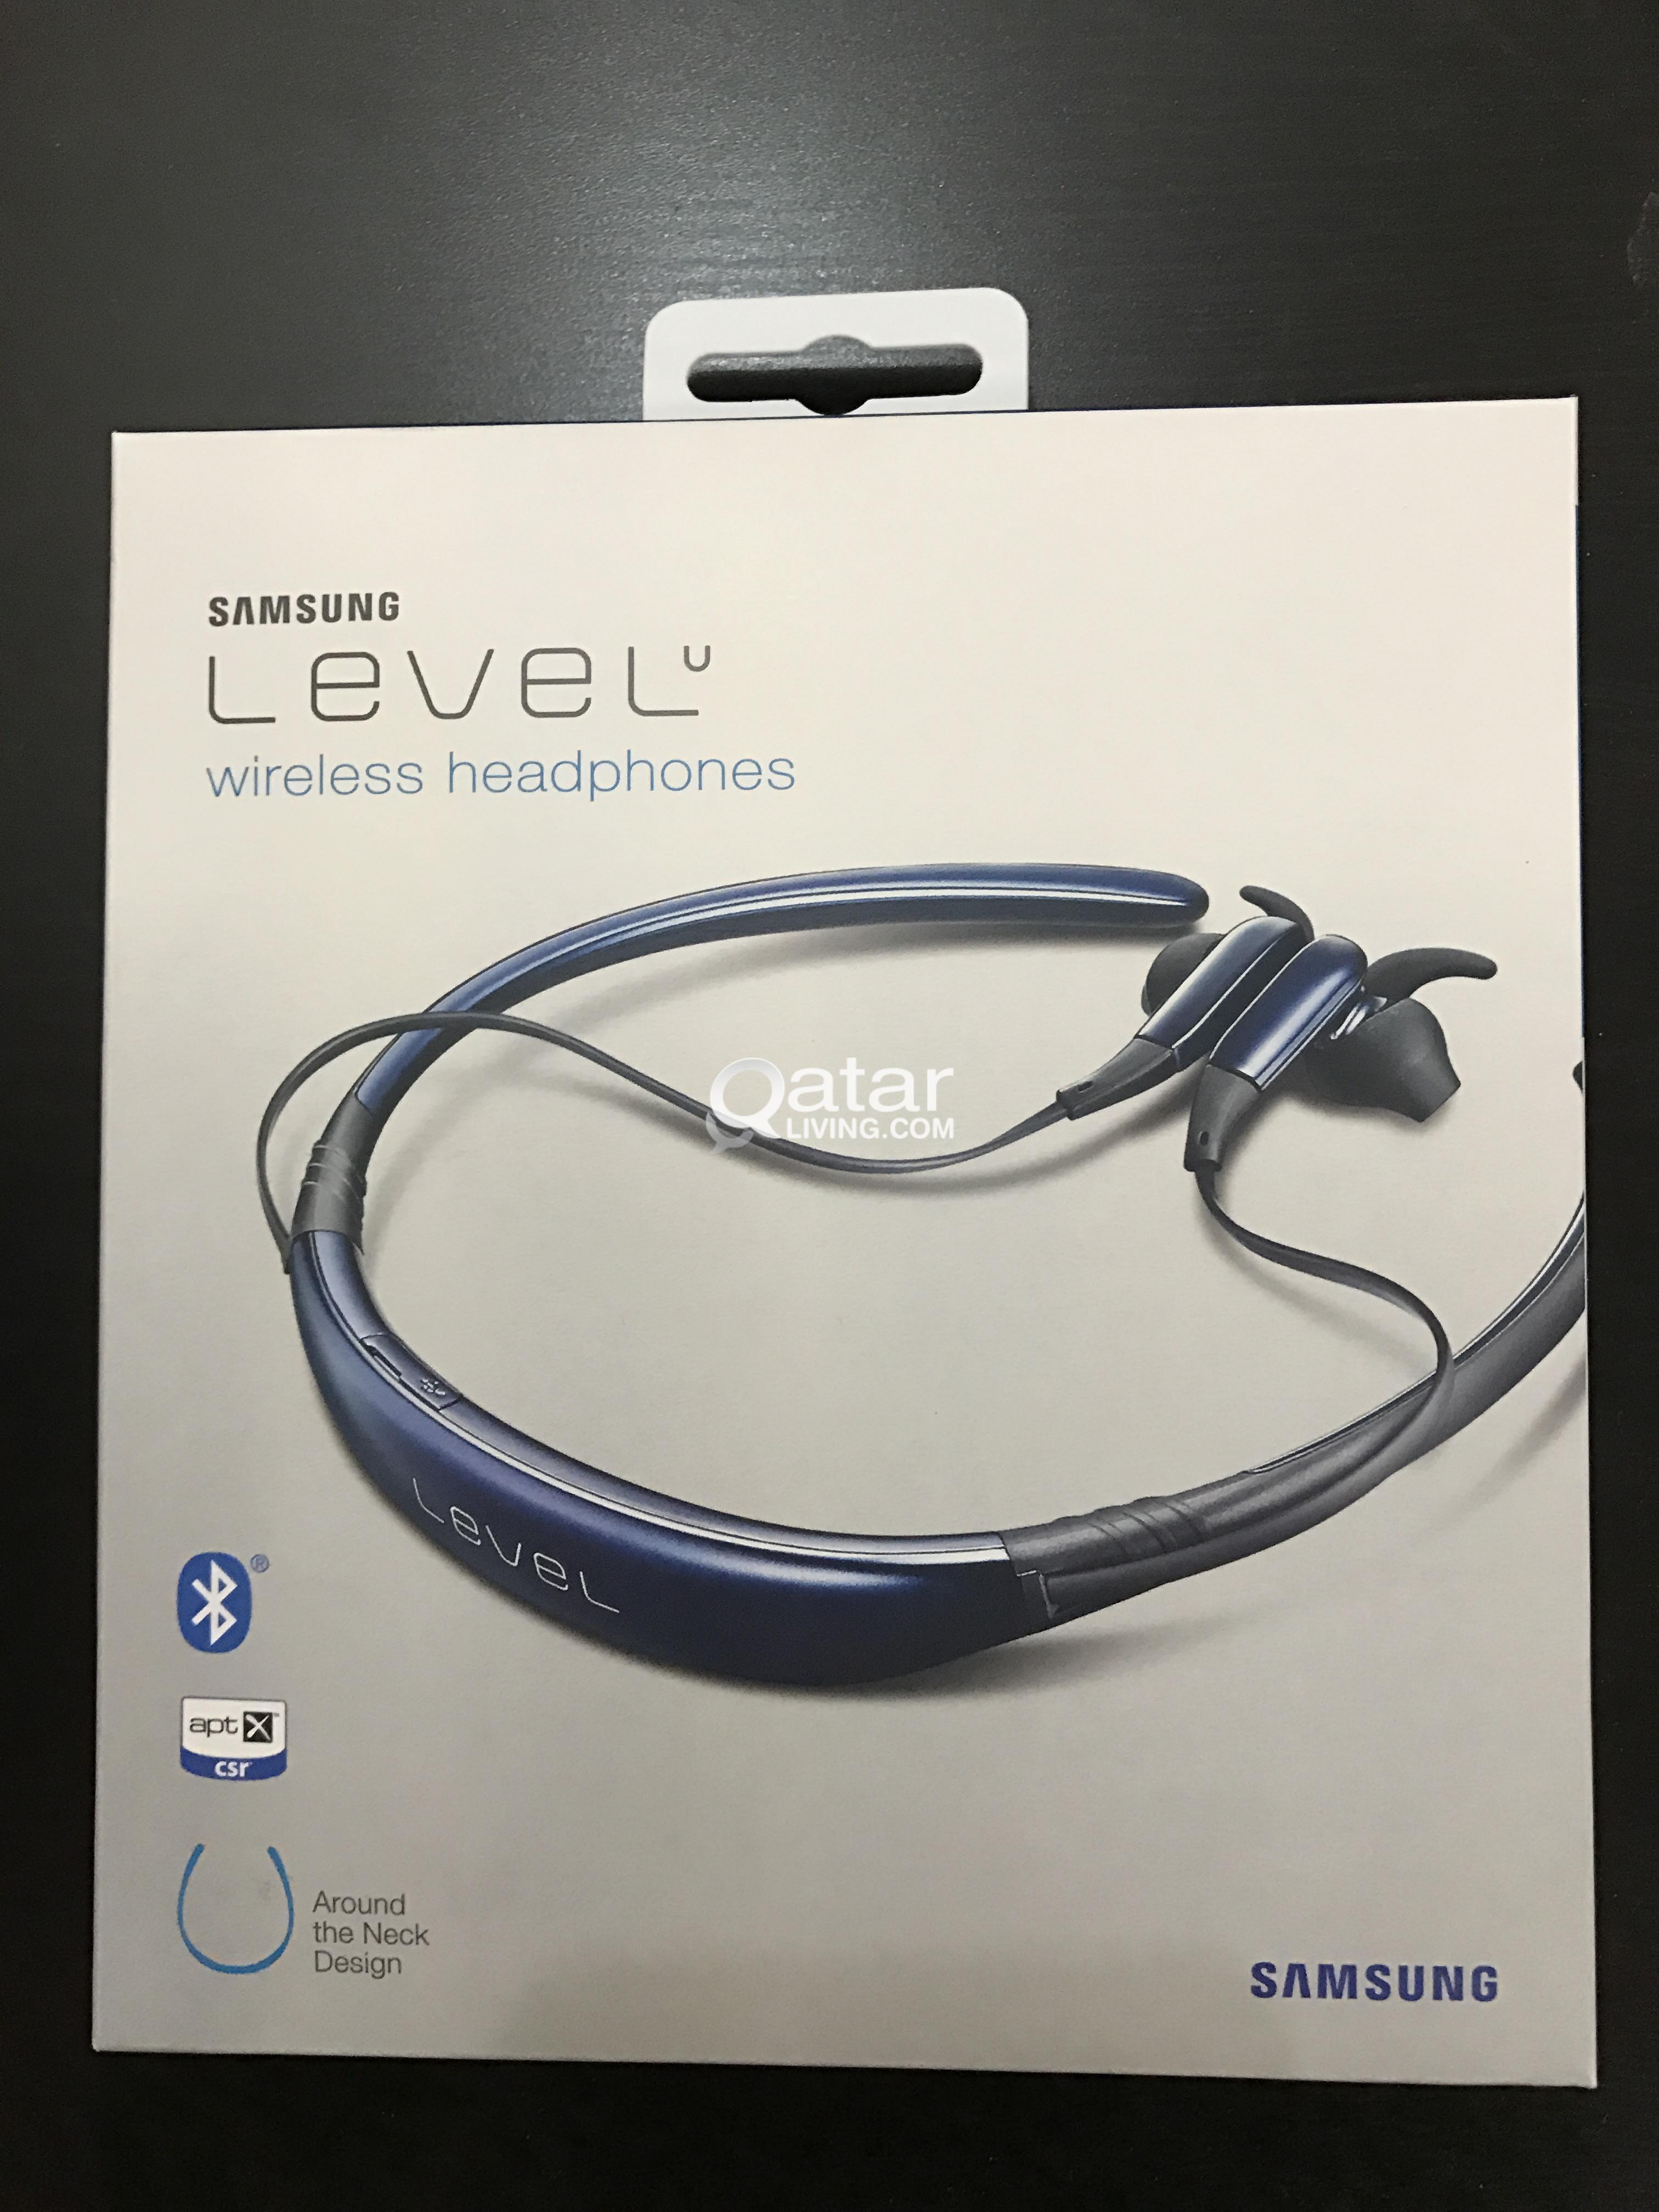 Samsung Level U Bluetooth Wireless In Ear Headphones With Microphone Qatar Living